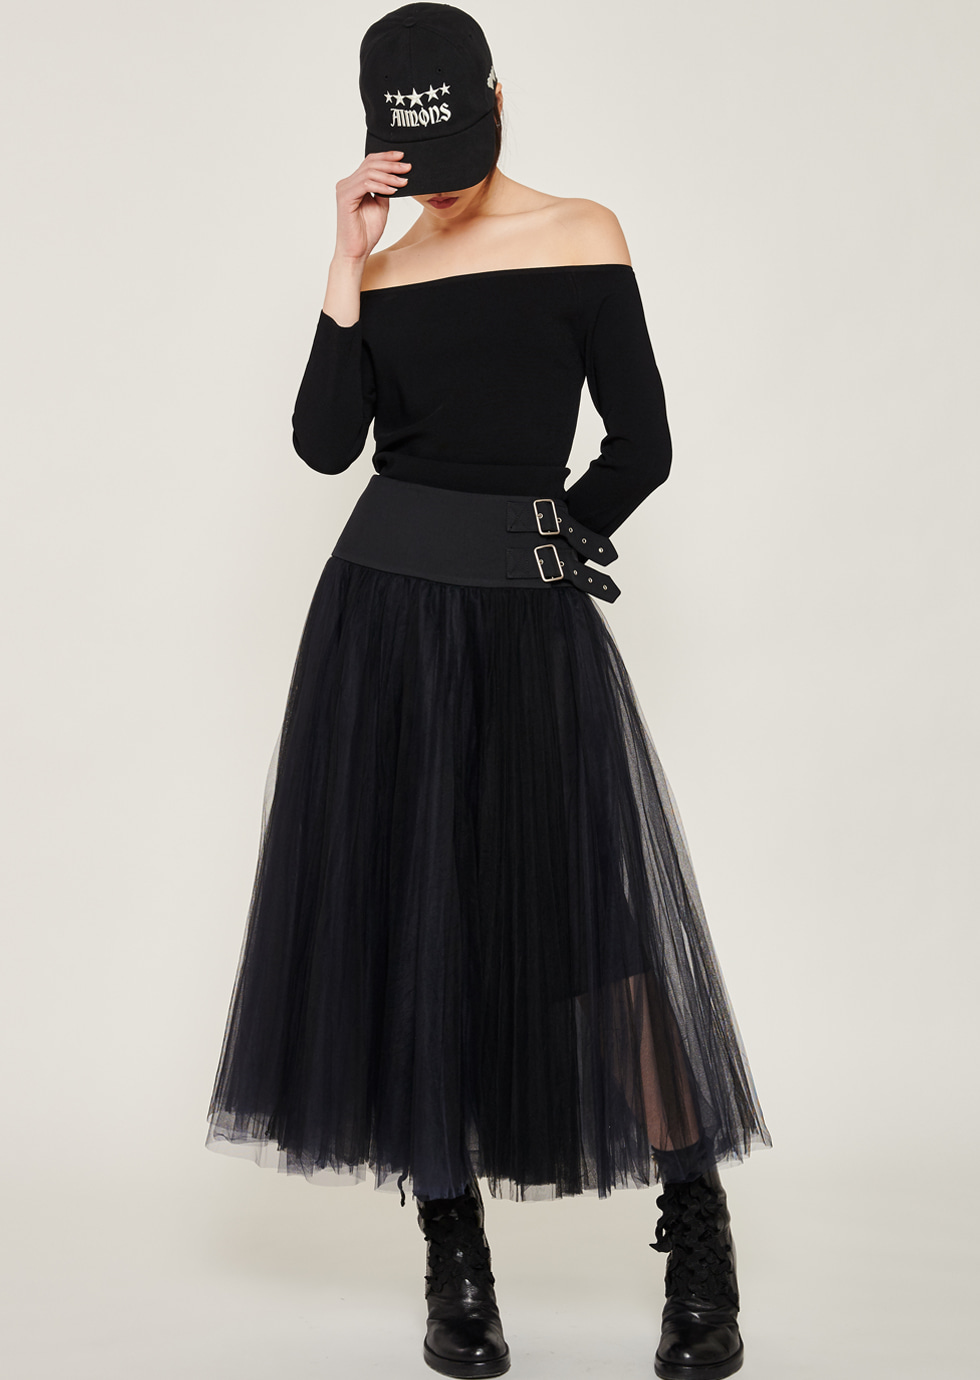 Black Mesh Pleats Sha Skirt - 에몽 공식스토어  aimons